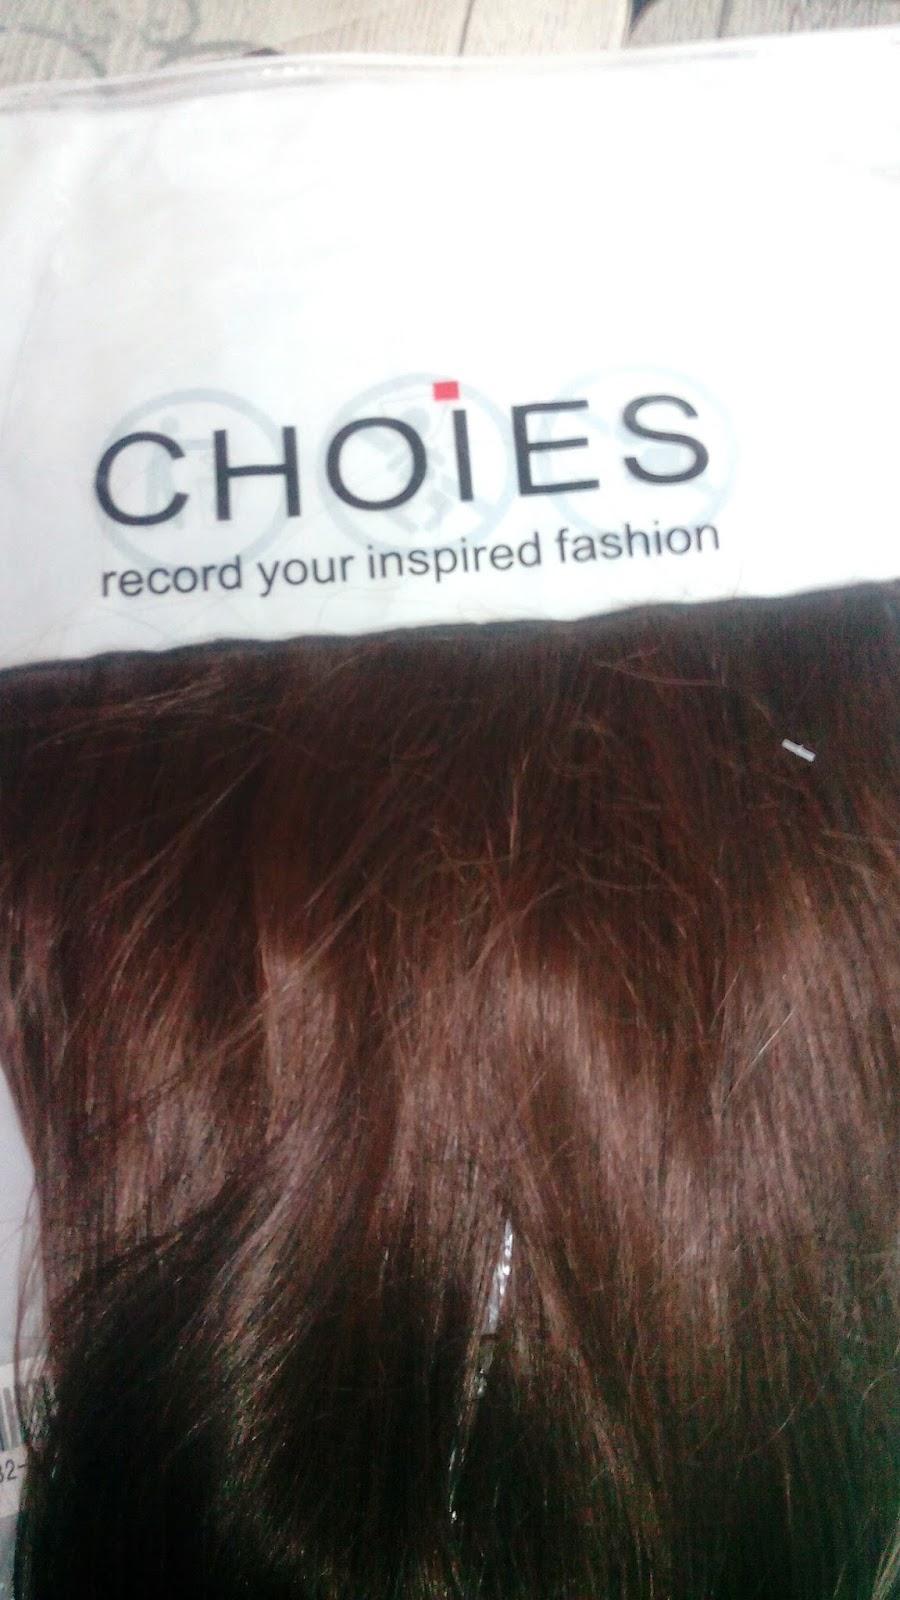 extensiones de pelo de choies